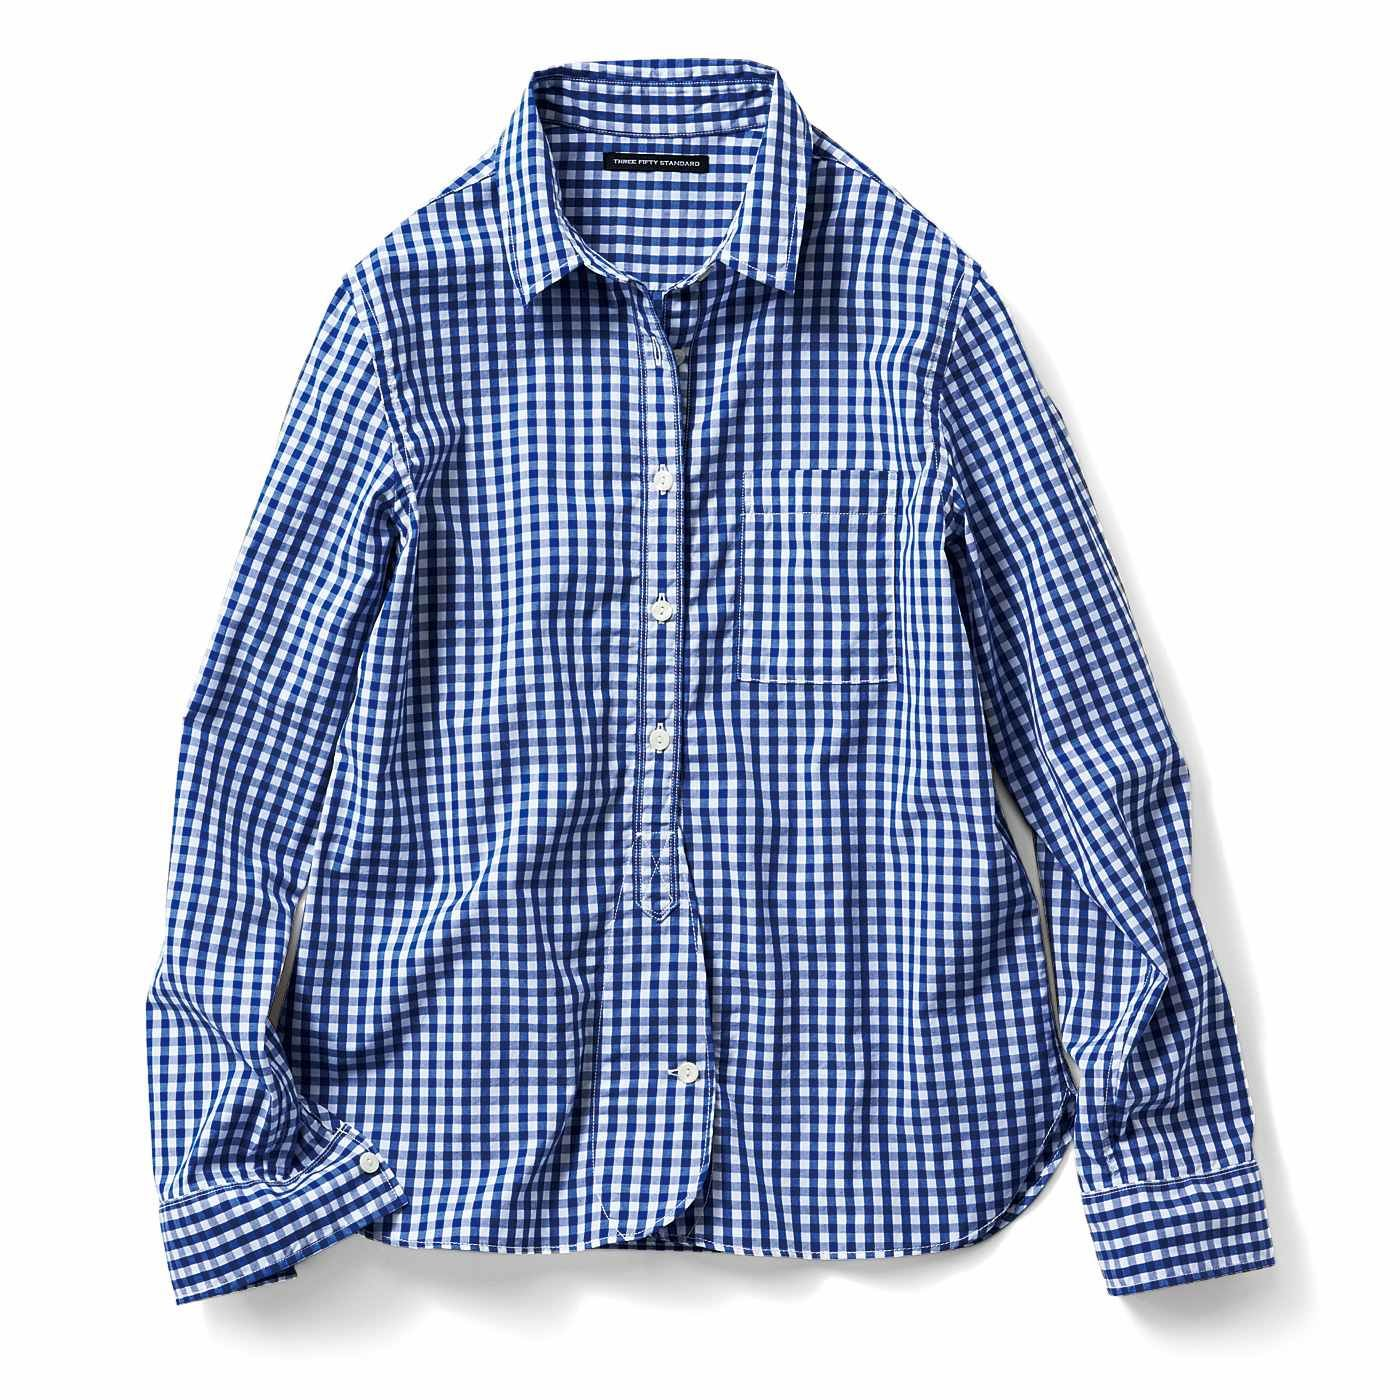 THREE FIFTY STANDARD スタンダード先染めチェックシャツ〈ブルー〉